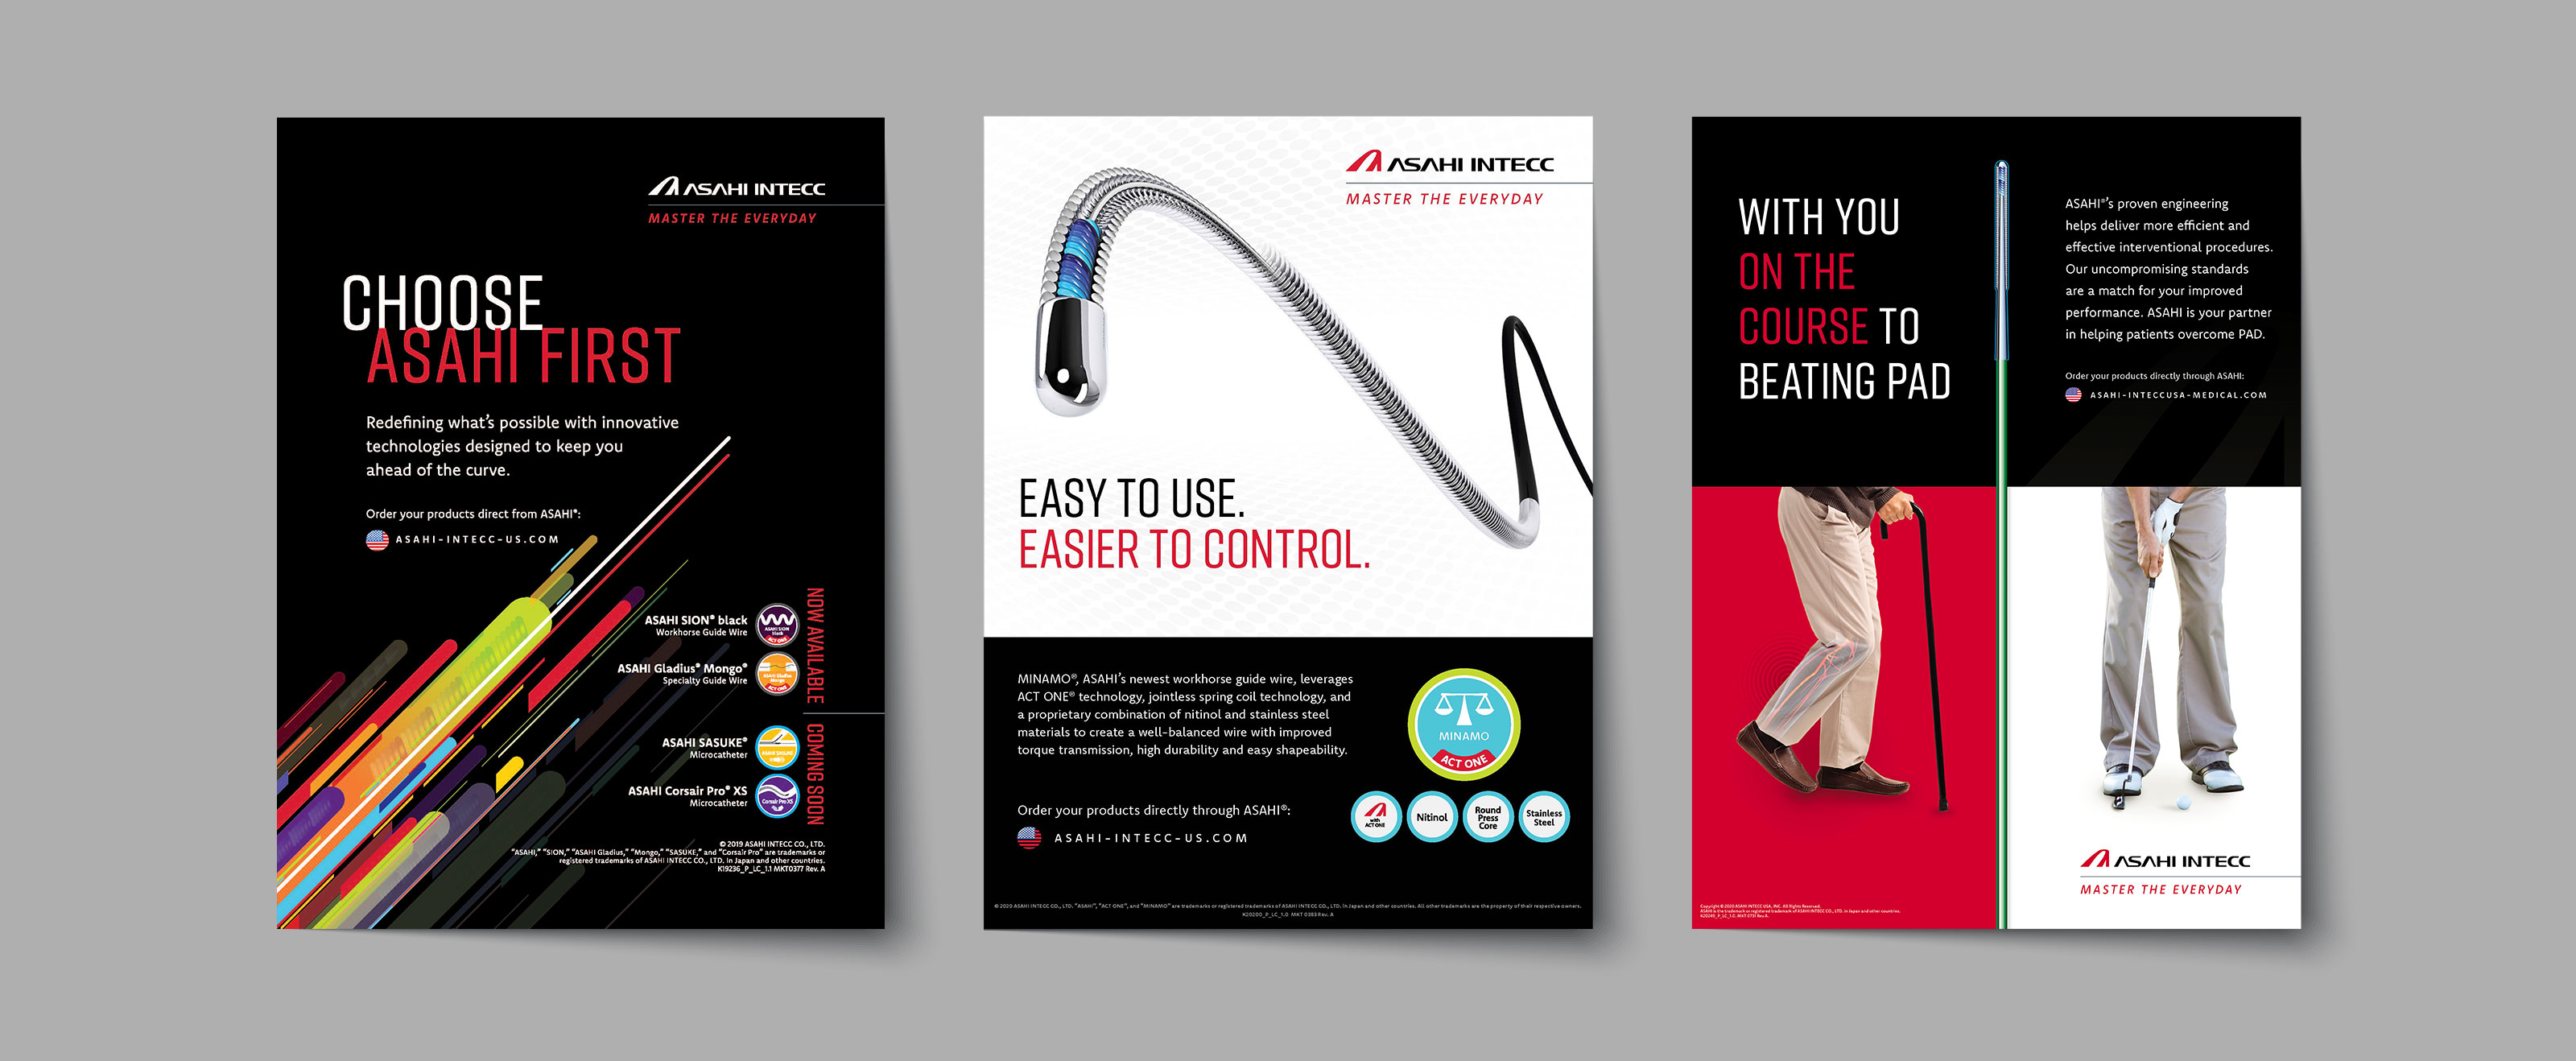 Asahi Intecc Medical Advertisement Designs